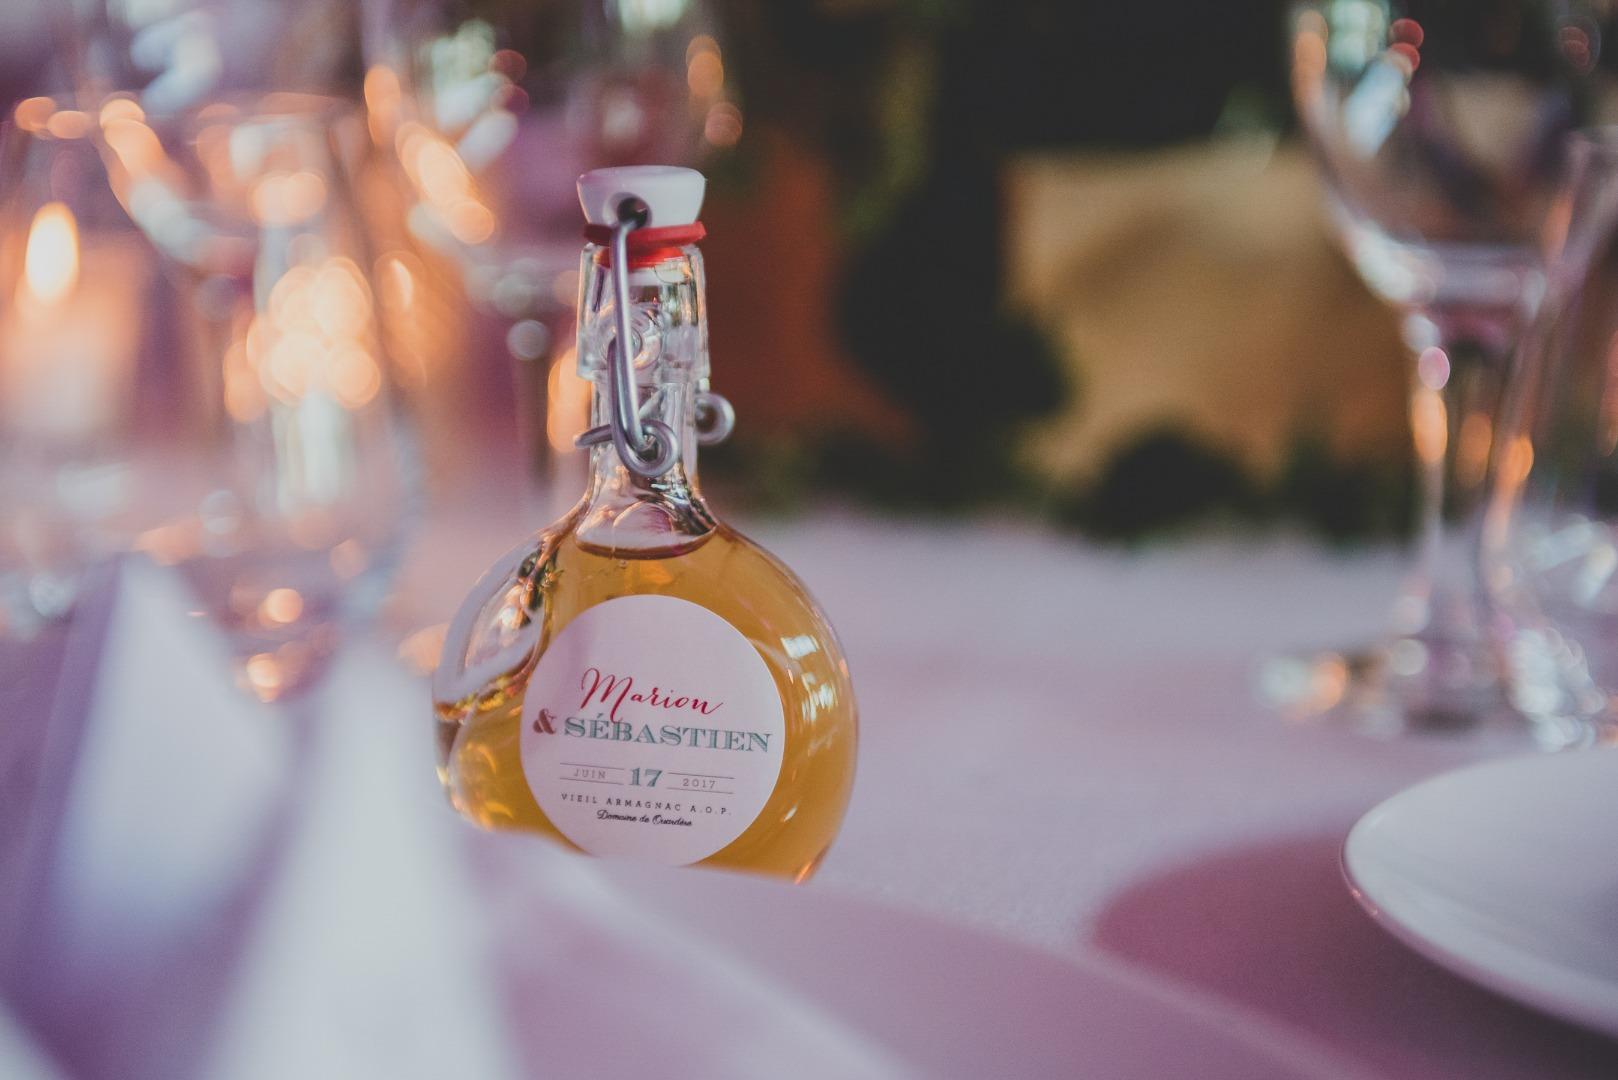 Cadeau invités sablée joliment emballé La Dolce Vita Occitanie organisatrice de mariage.jpg